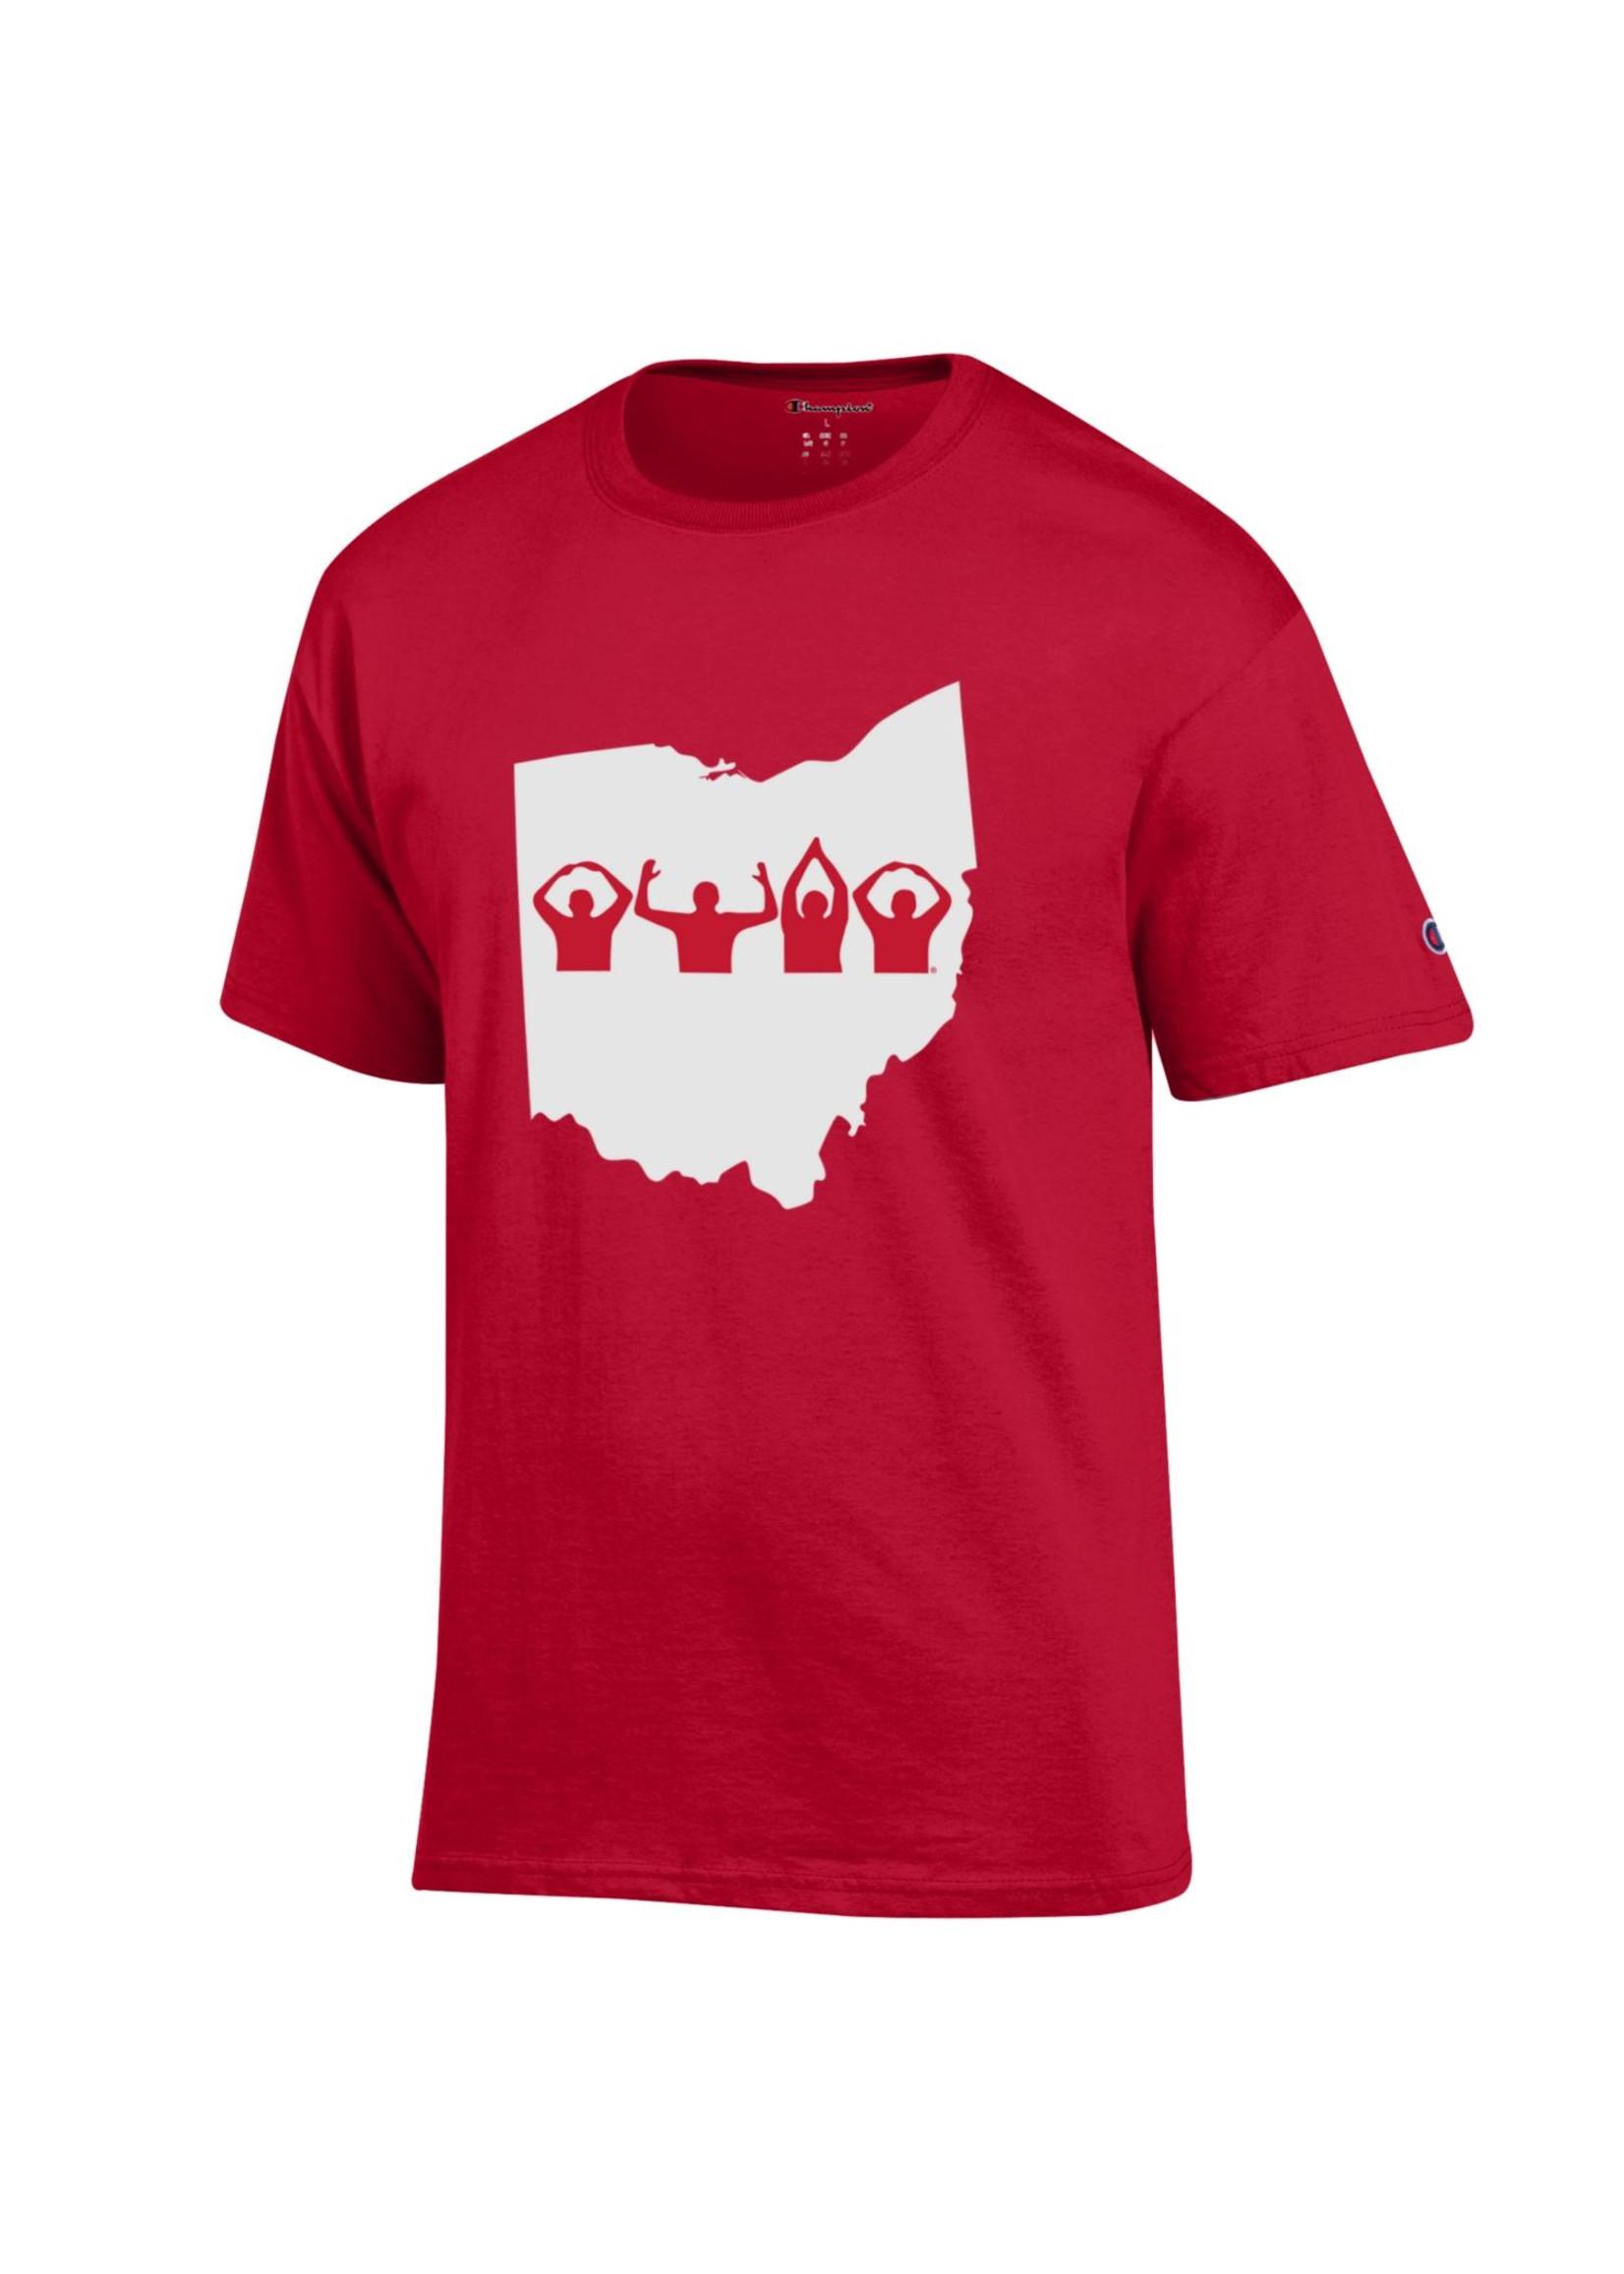 Champion Ohio State Buckeyes O-H-I-O Tee